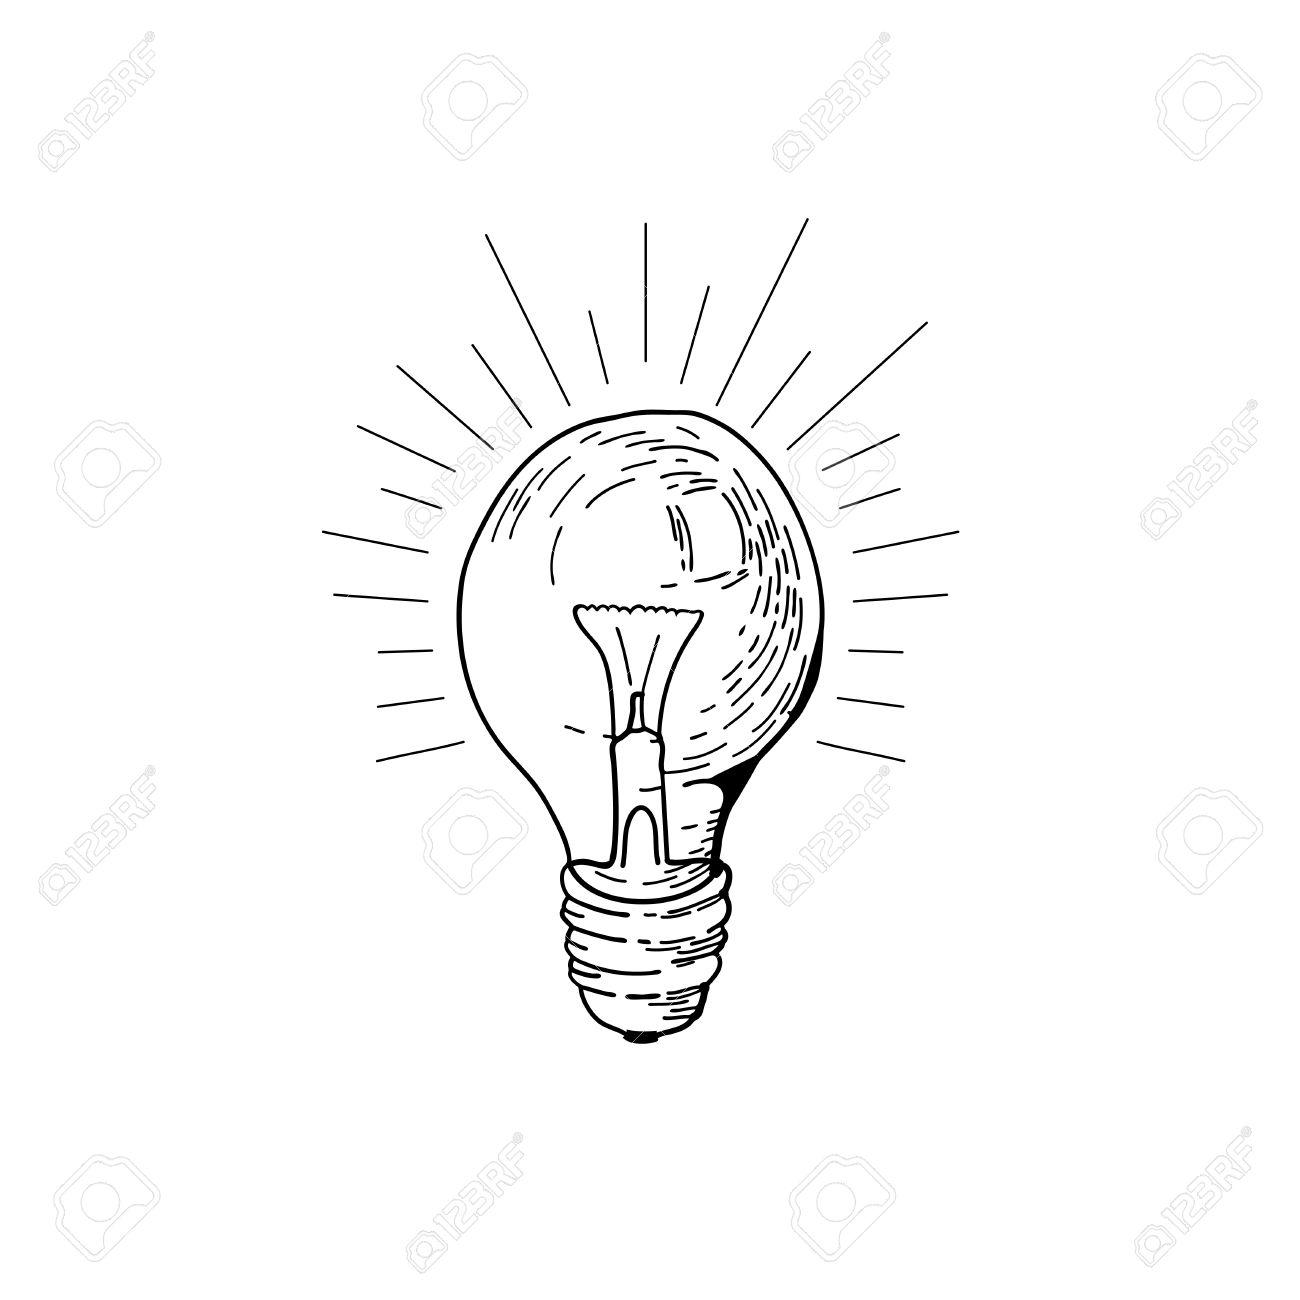 1300x1300 Drawn Hand Light Bulb